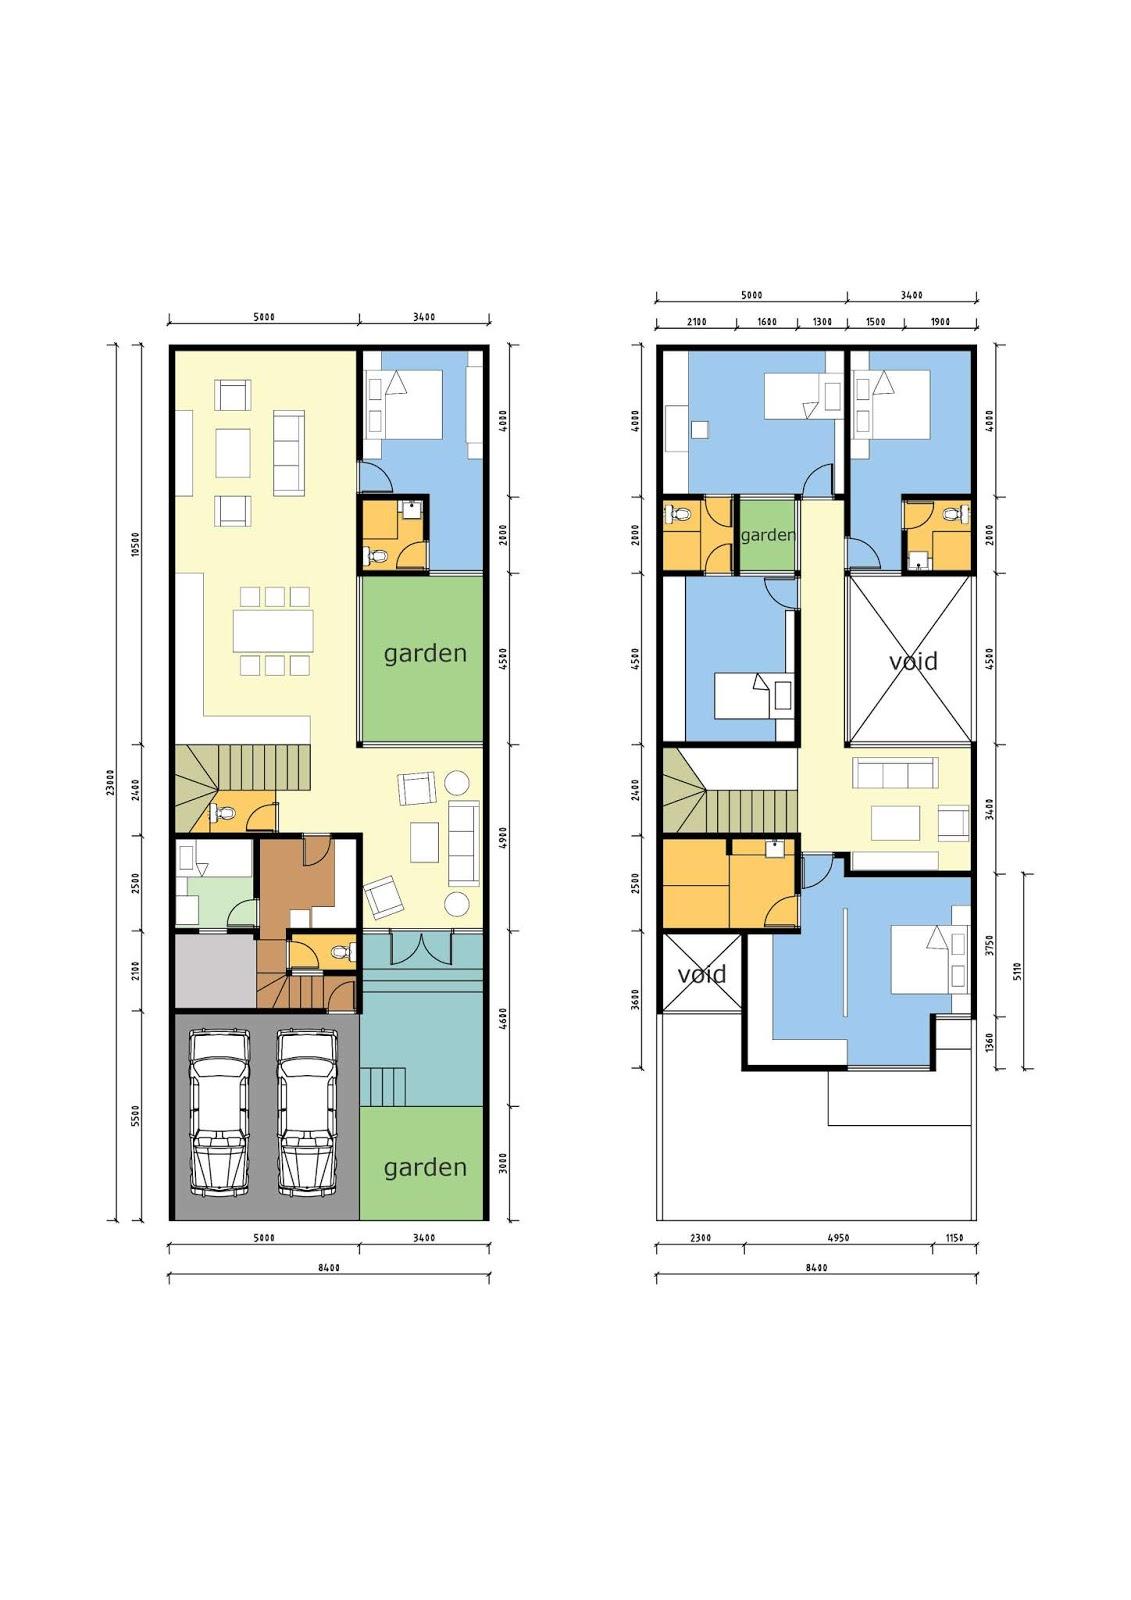 Desain Rumah Memanjang : desain, rumah, memanjang, Desain, Rumah, Memanjang, Belakang, Minimalis, Sederhana